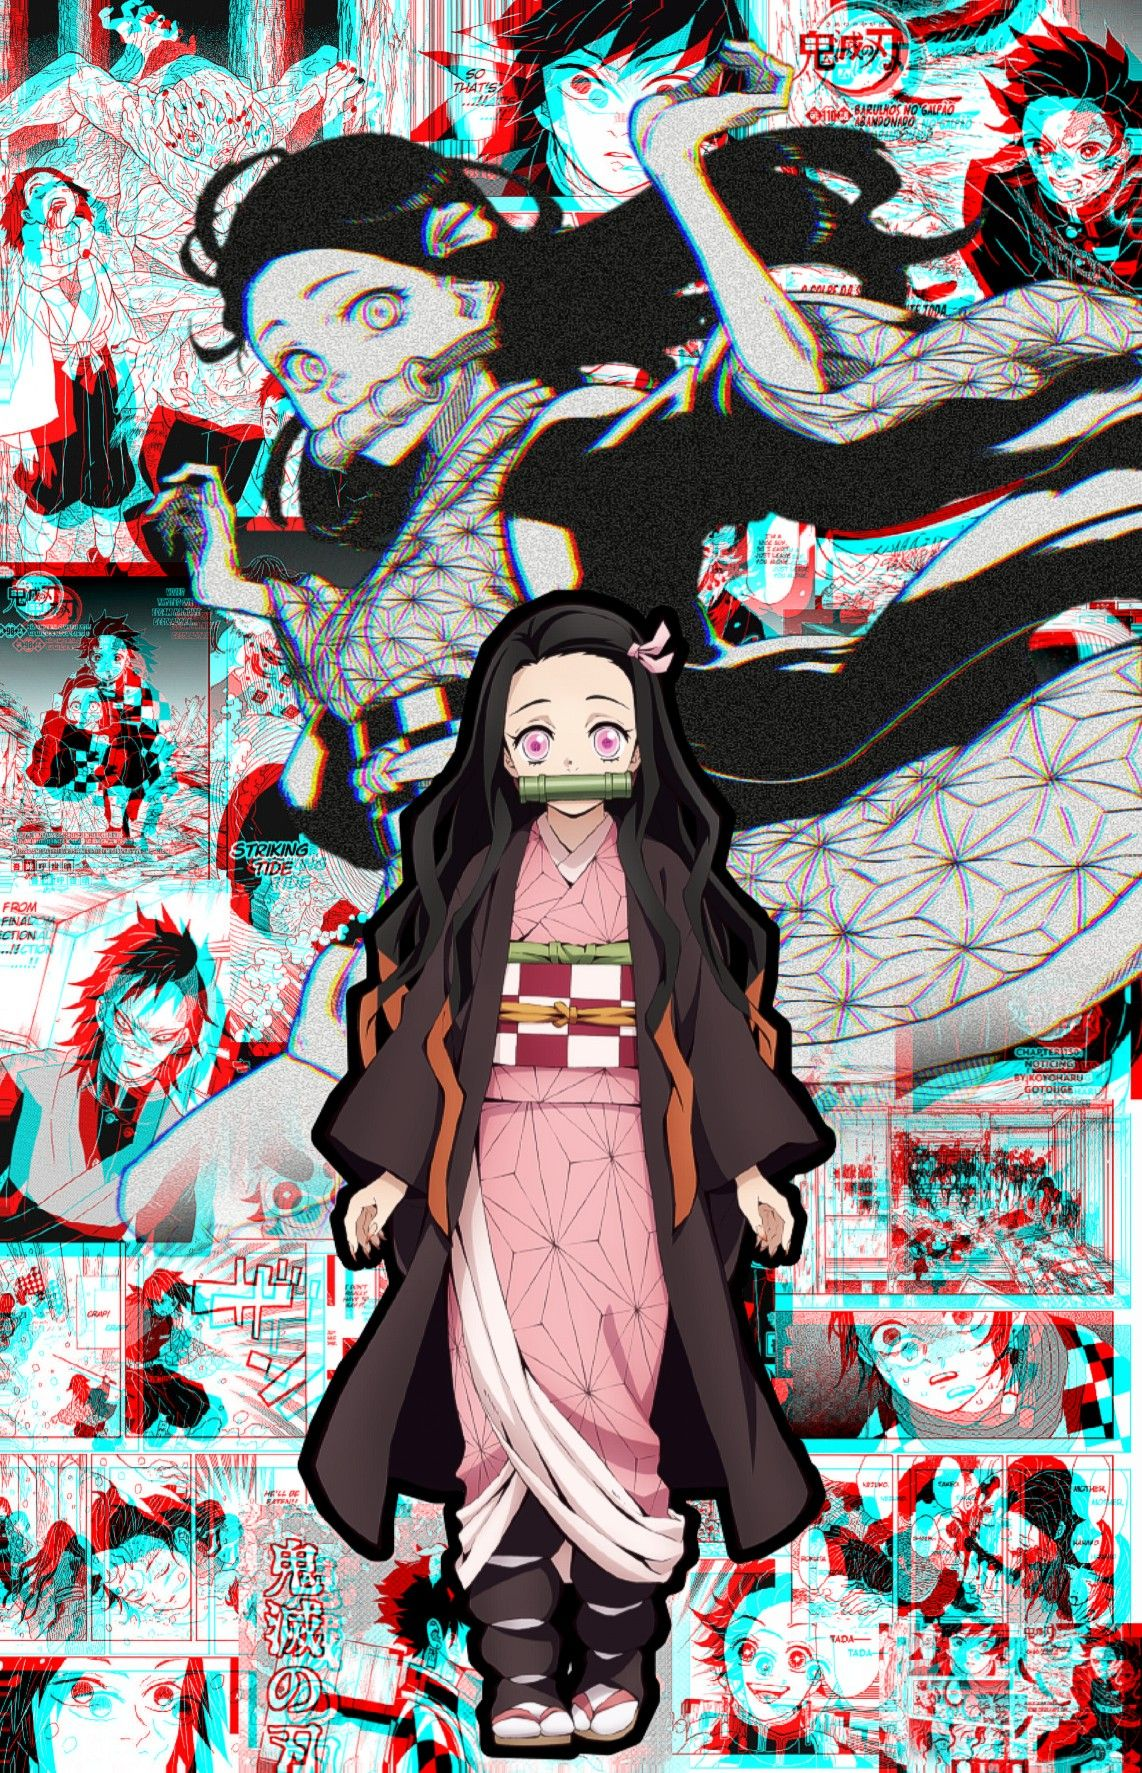 Google Image Result For Https Wallpapercave Com Wp Wp4499804 Jpg Fond D Ecran Dessin Fond D Ecran Anime Fond D Ecran Telephone Manga